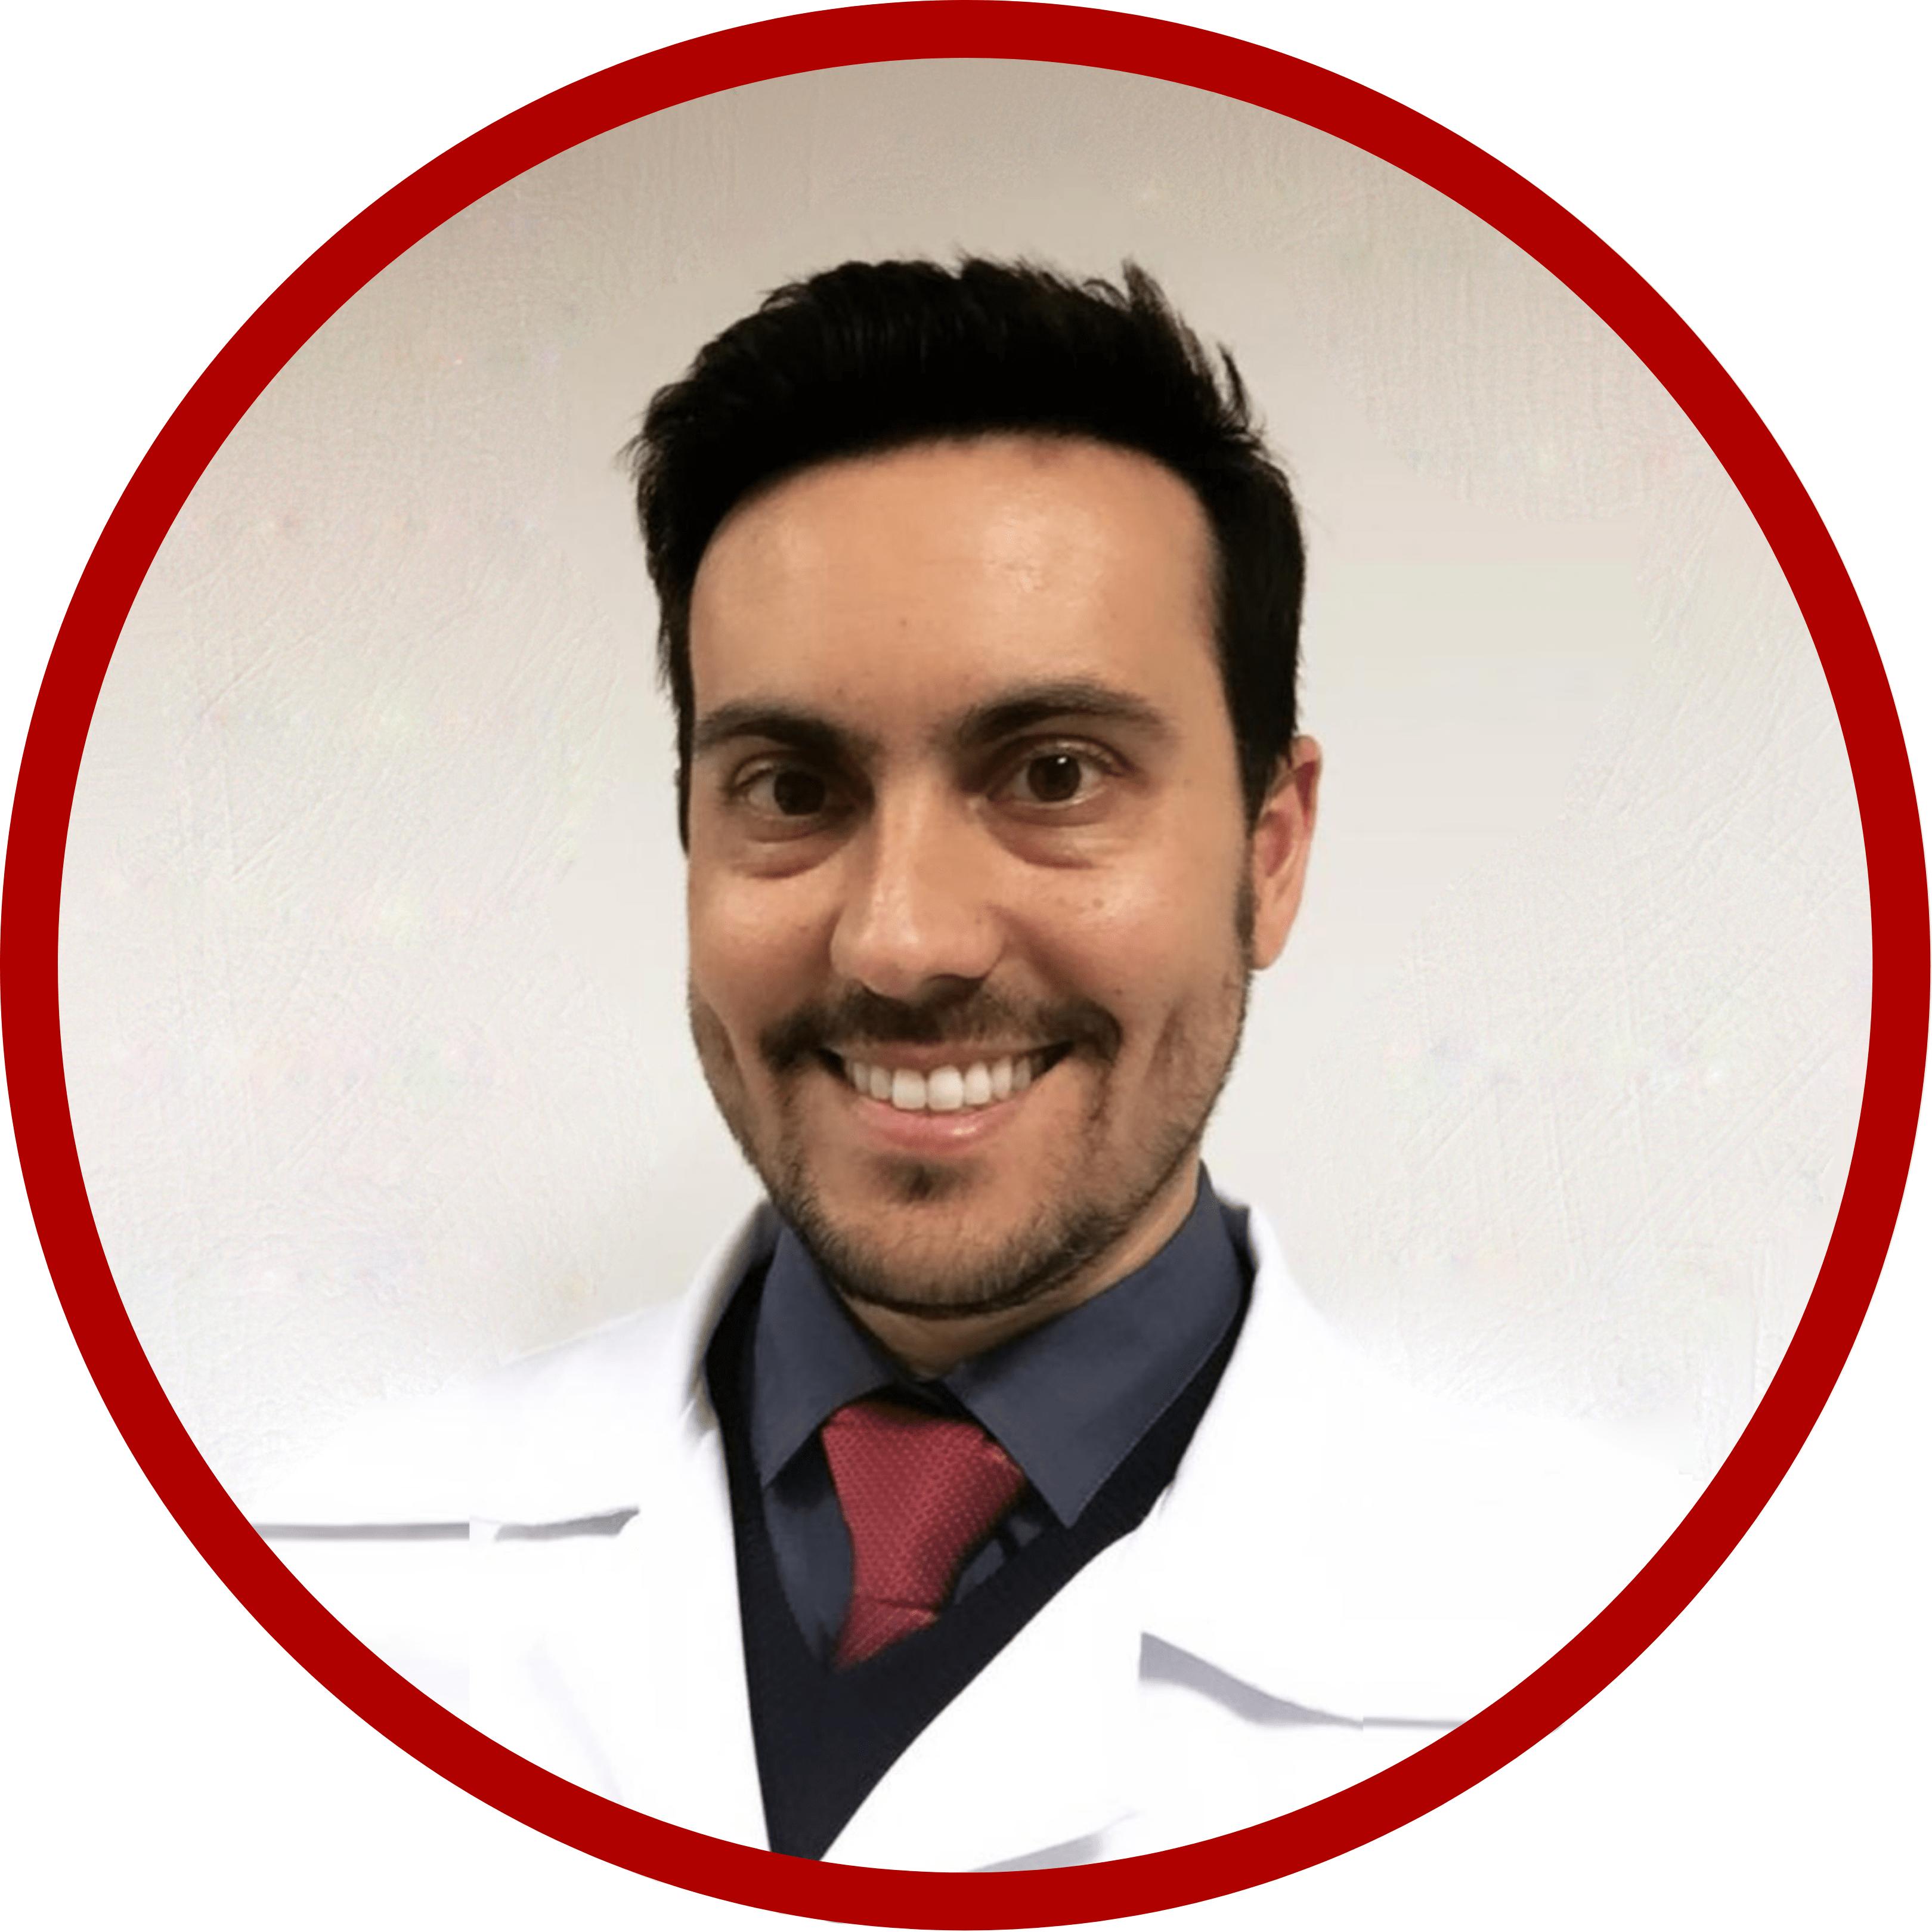 Dr. Tiago Carrion de Moraes